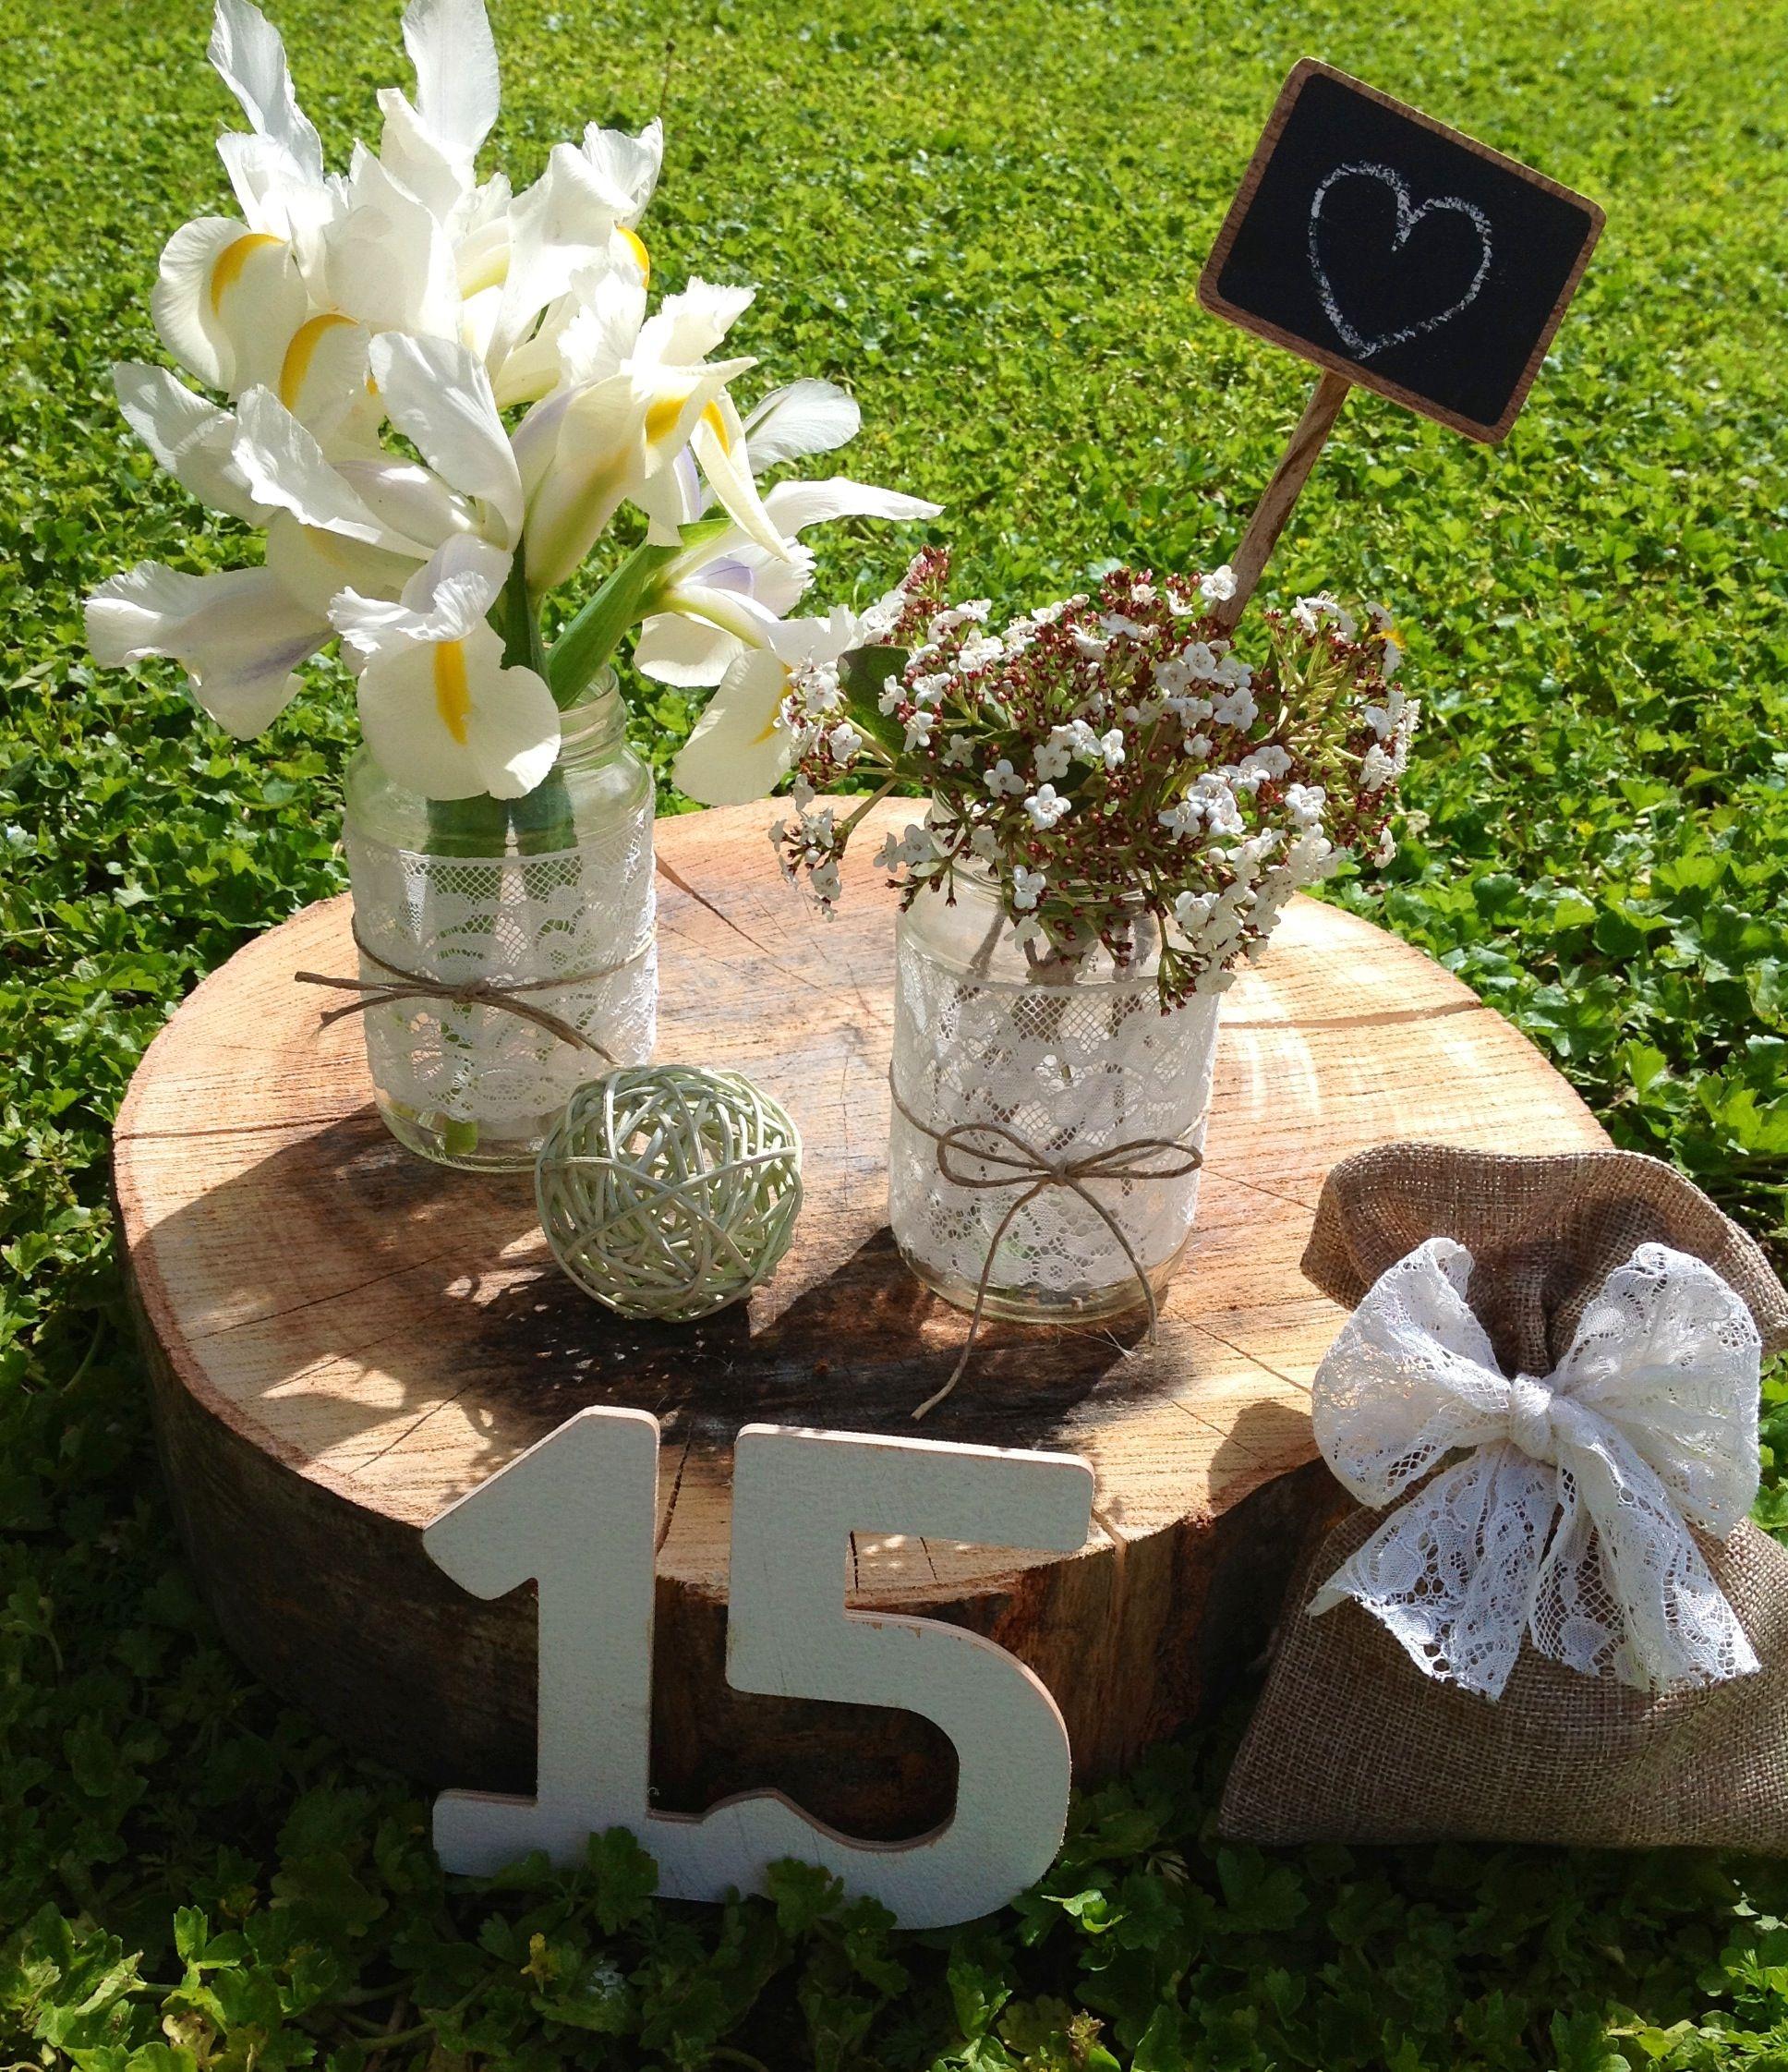 Country wedding centerpiece   Wedding Ideas   Pinterest - photo#12